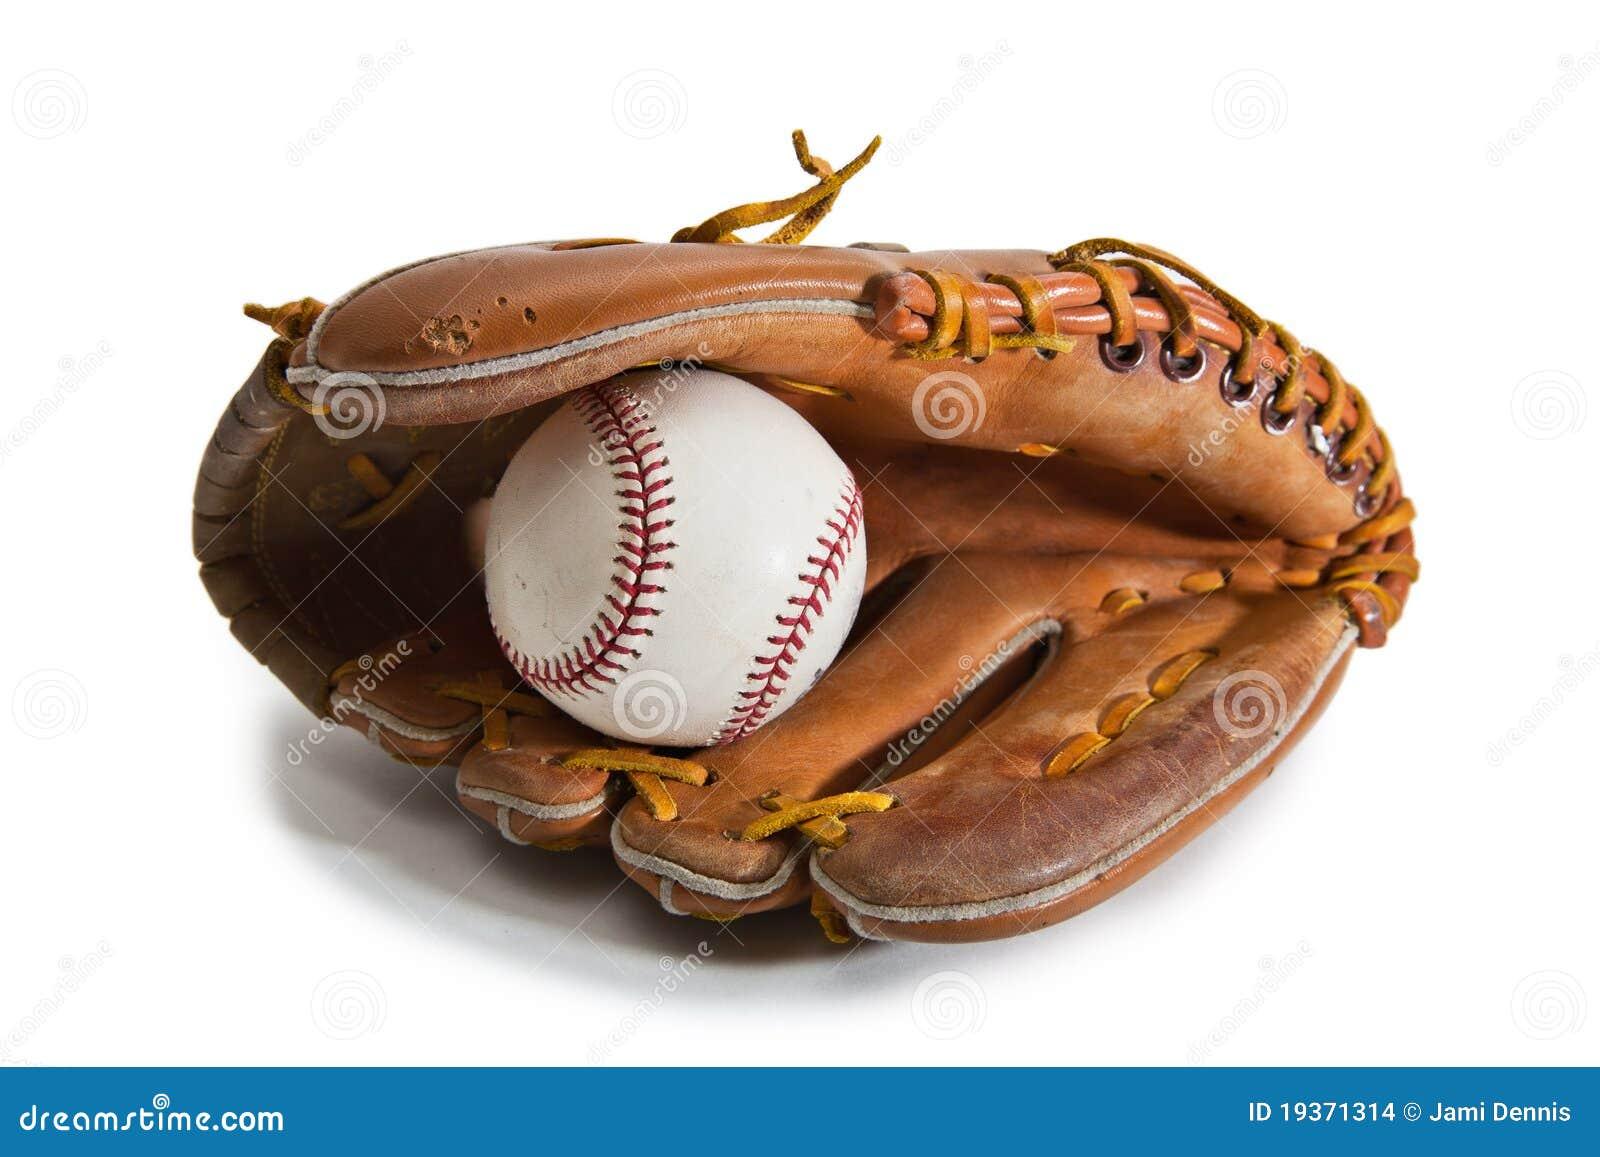 baseball glove and ball stock photo image of play child